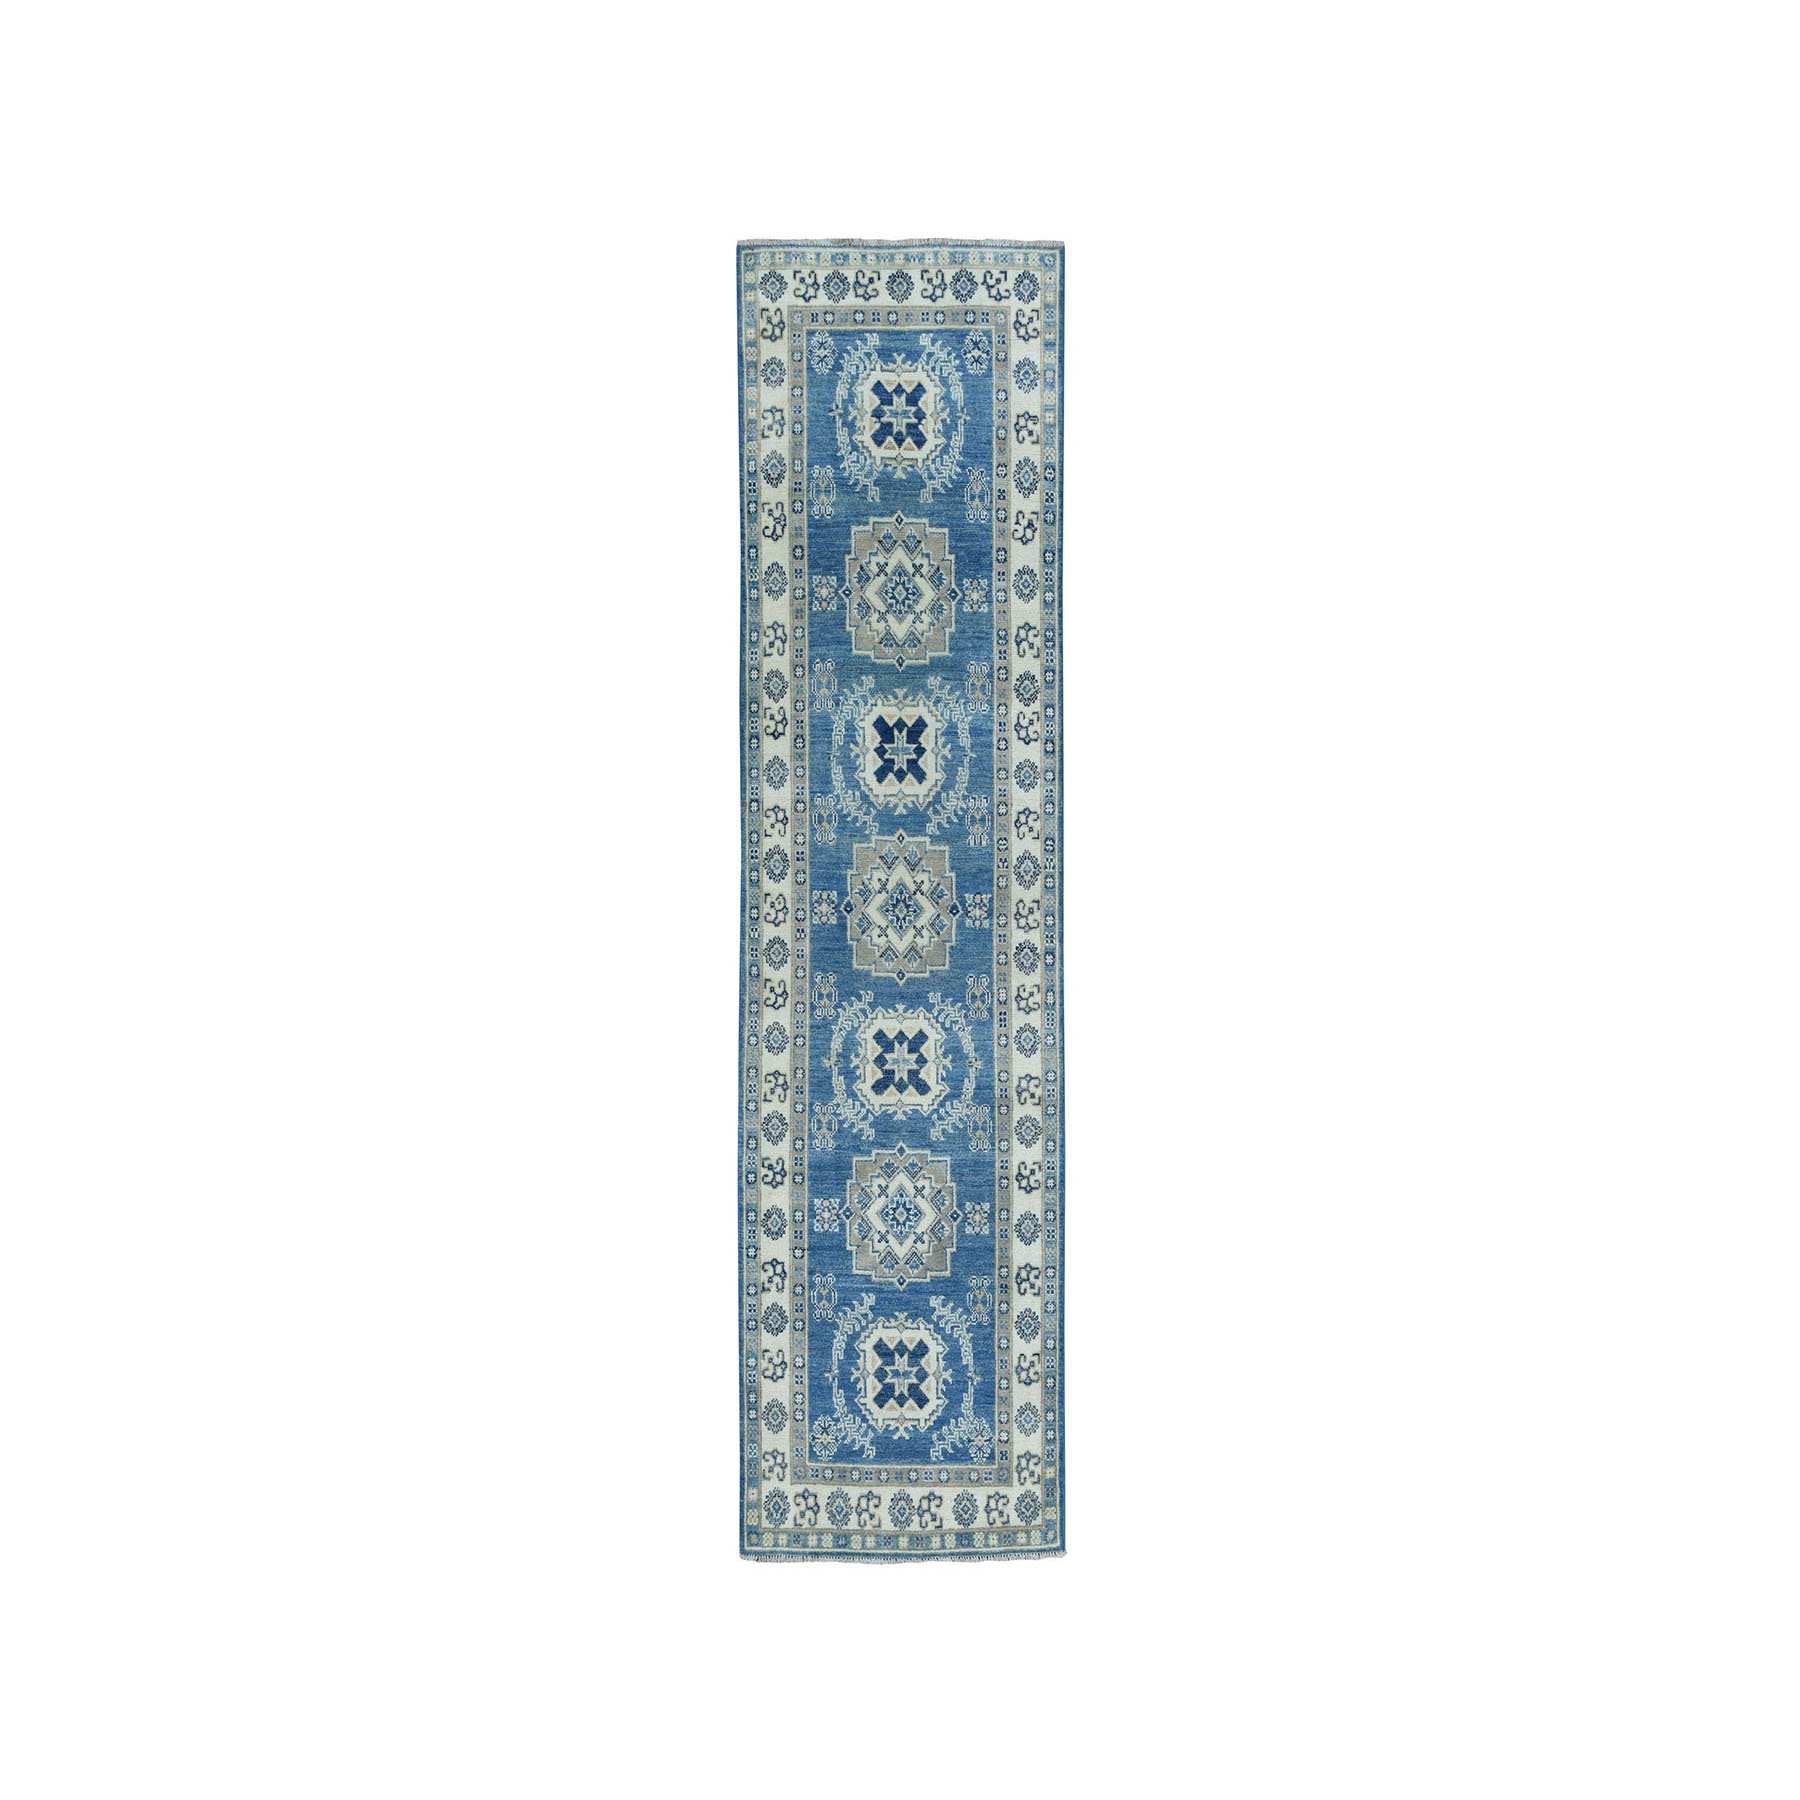 "2'7""X8' Vintage Look Kazak Geometric Design Blue Runner Pure Wool Hand-Knotted Oriental Rug moaeaaaa"